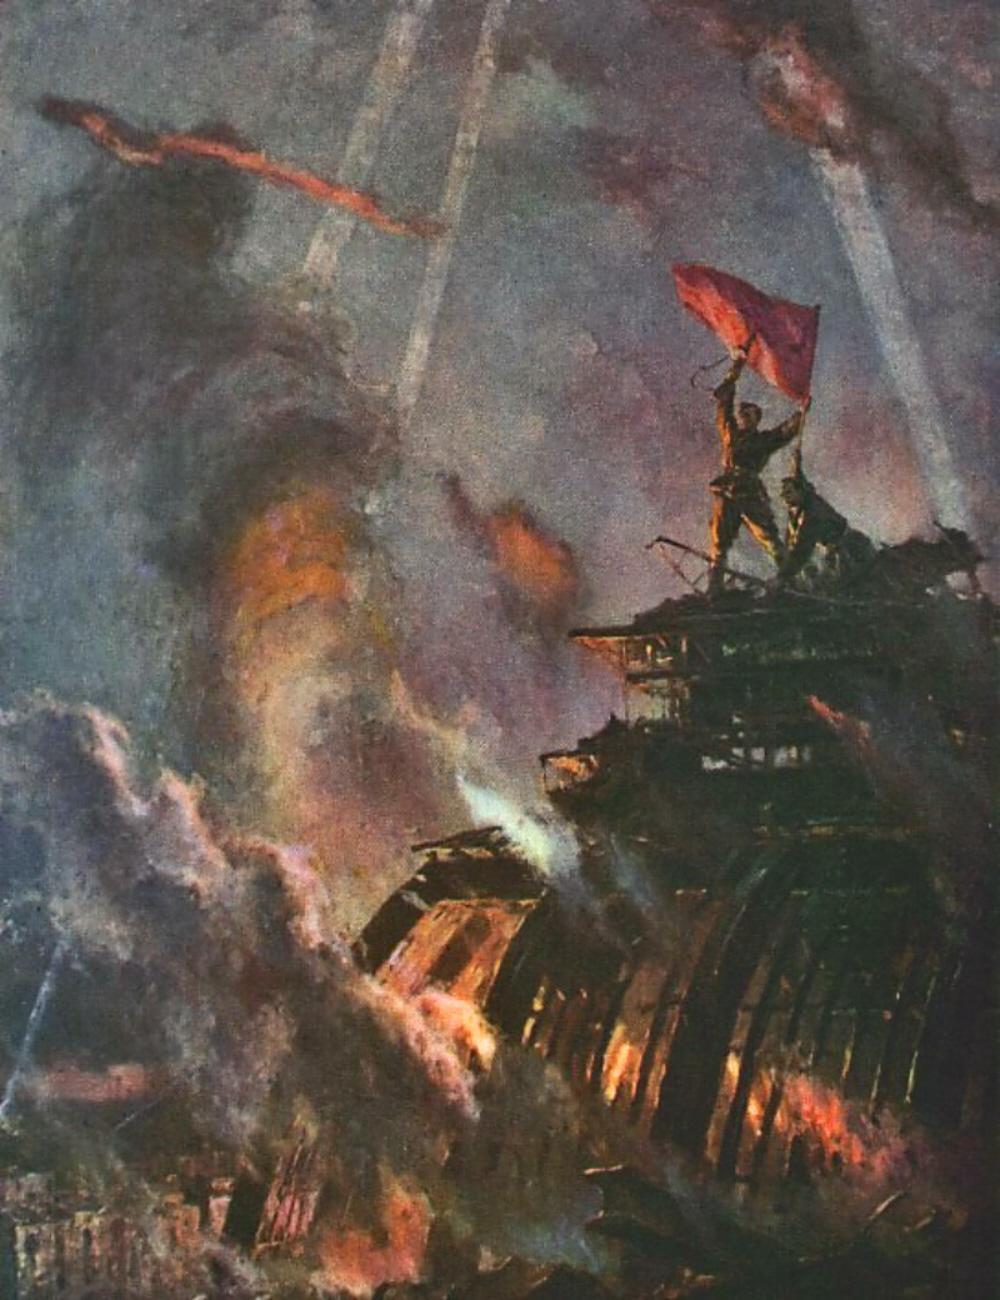 V Bozhko. Raising the Victory Banner Over Berlin. nd